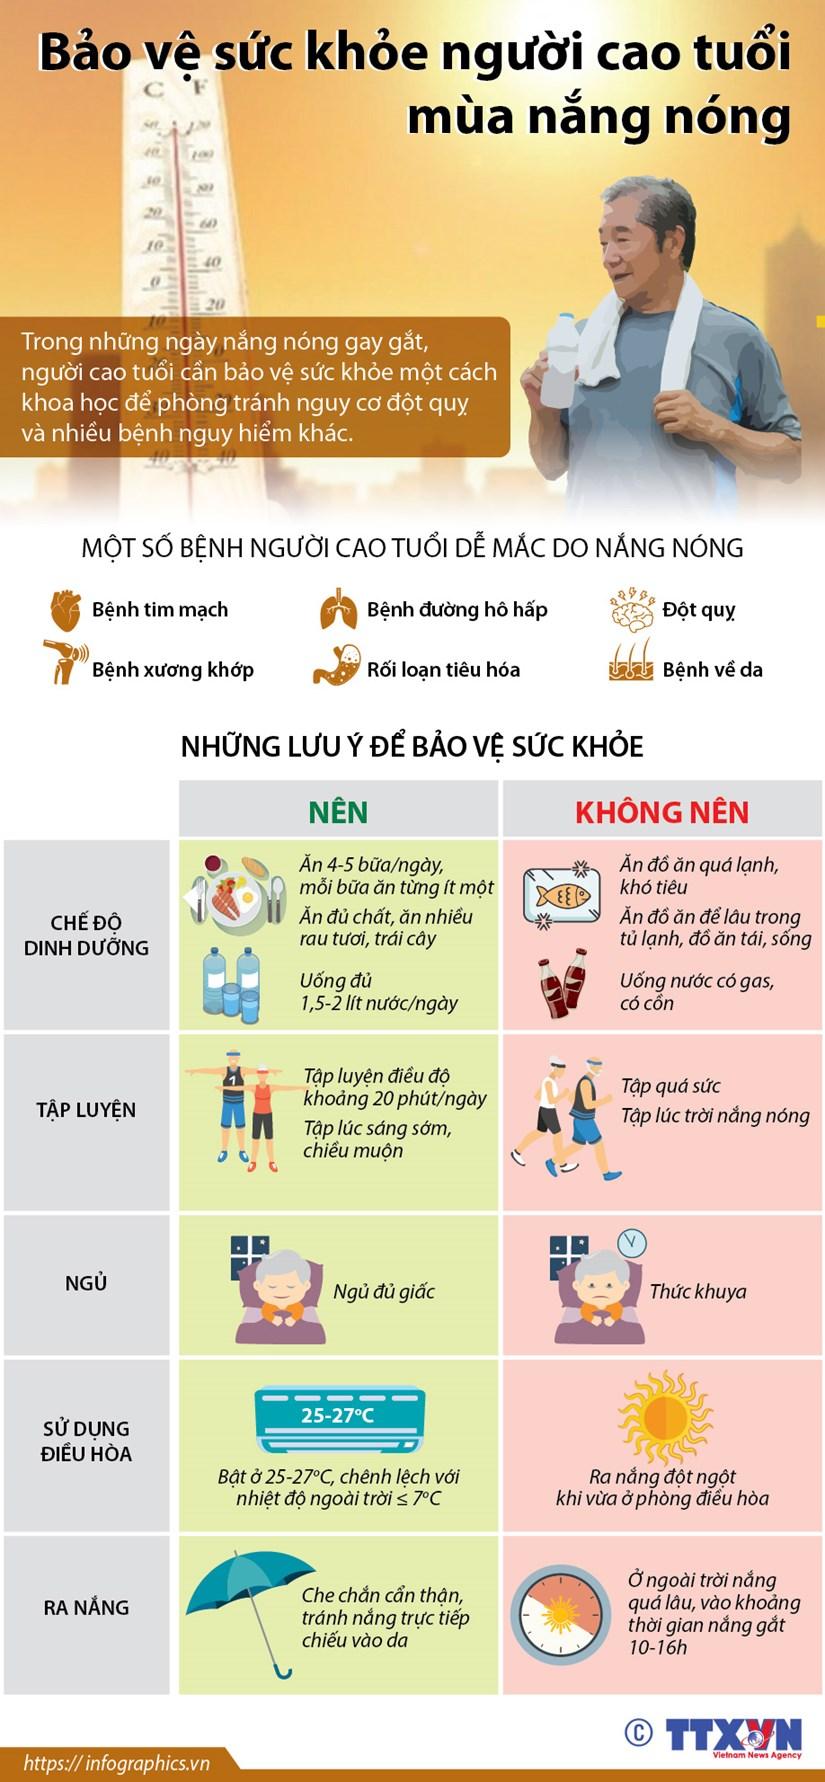 [Infographics] Nguoi cao tuoi nen lam gi de bao ve suc khoe mua nong? hinh anh 1